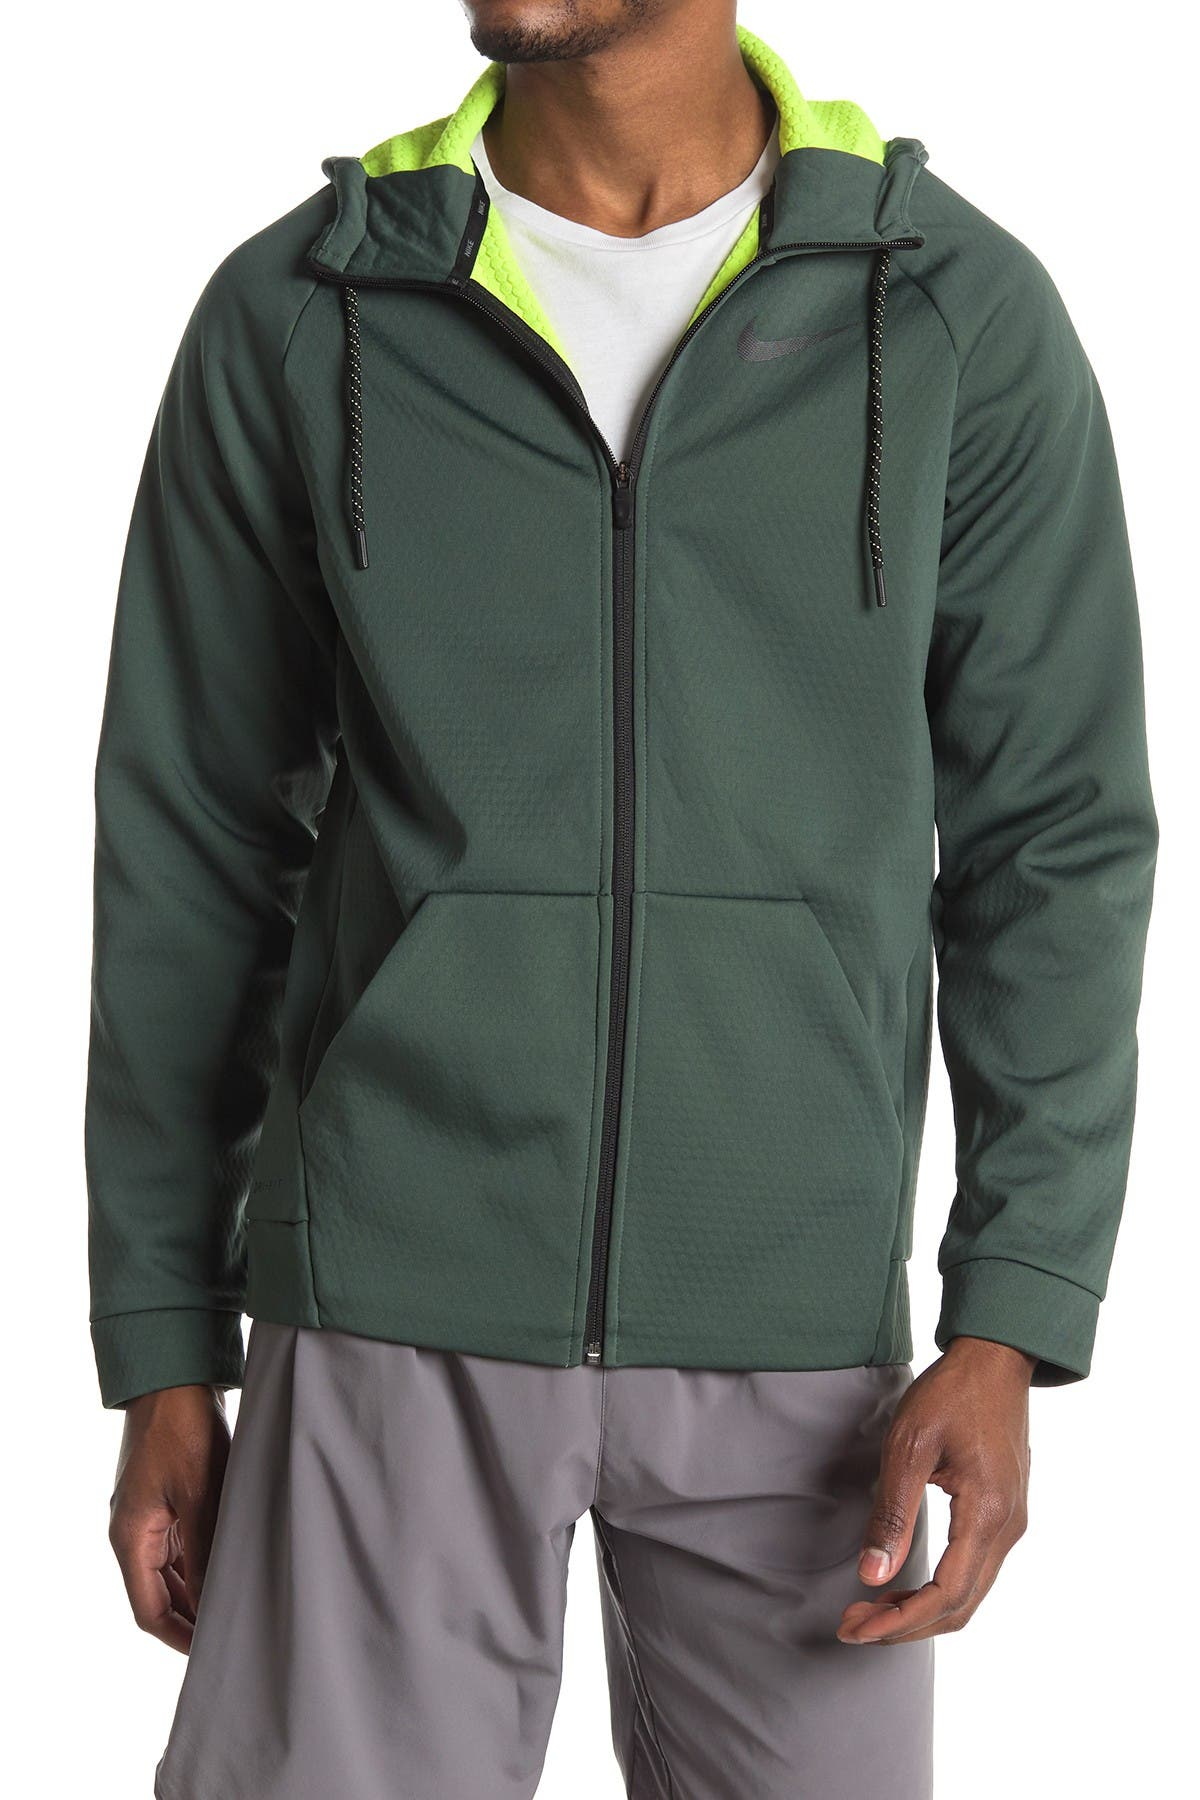 Image of Nike Therma Waffle Knit Zip Hoodie